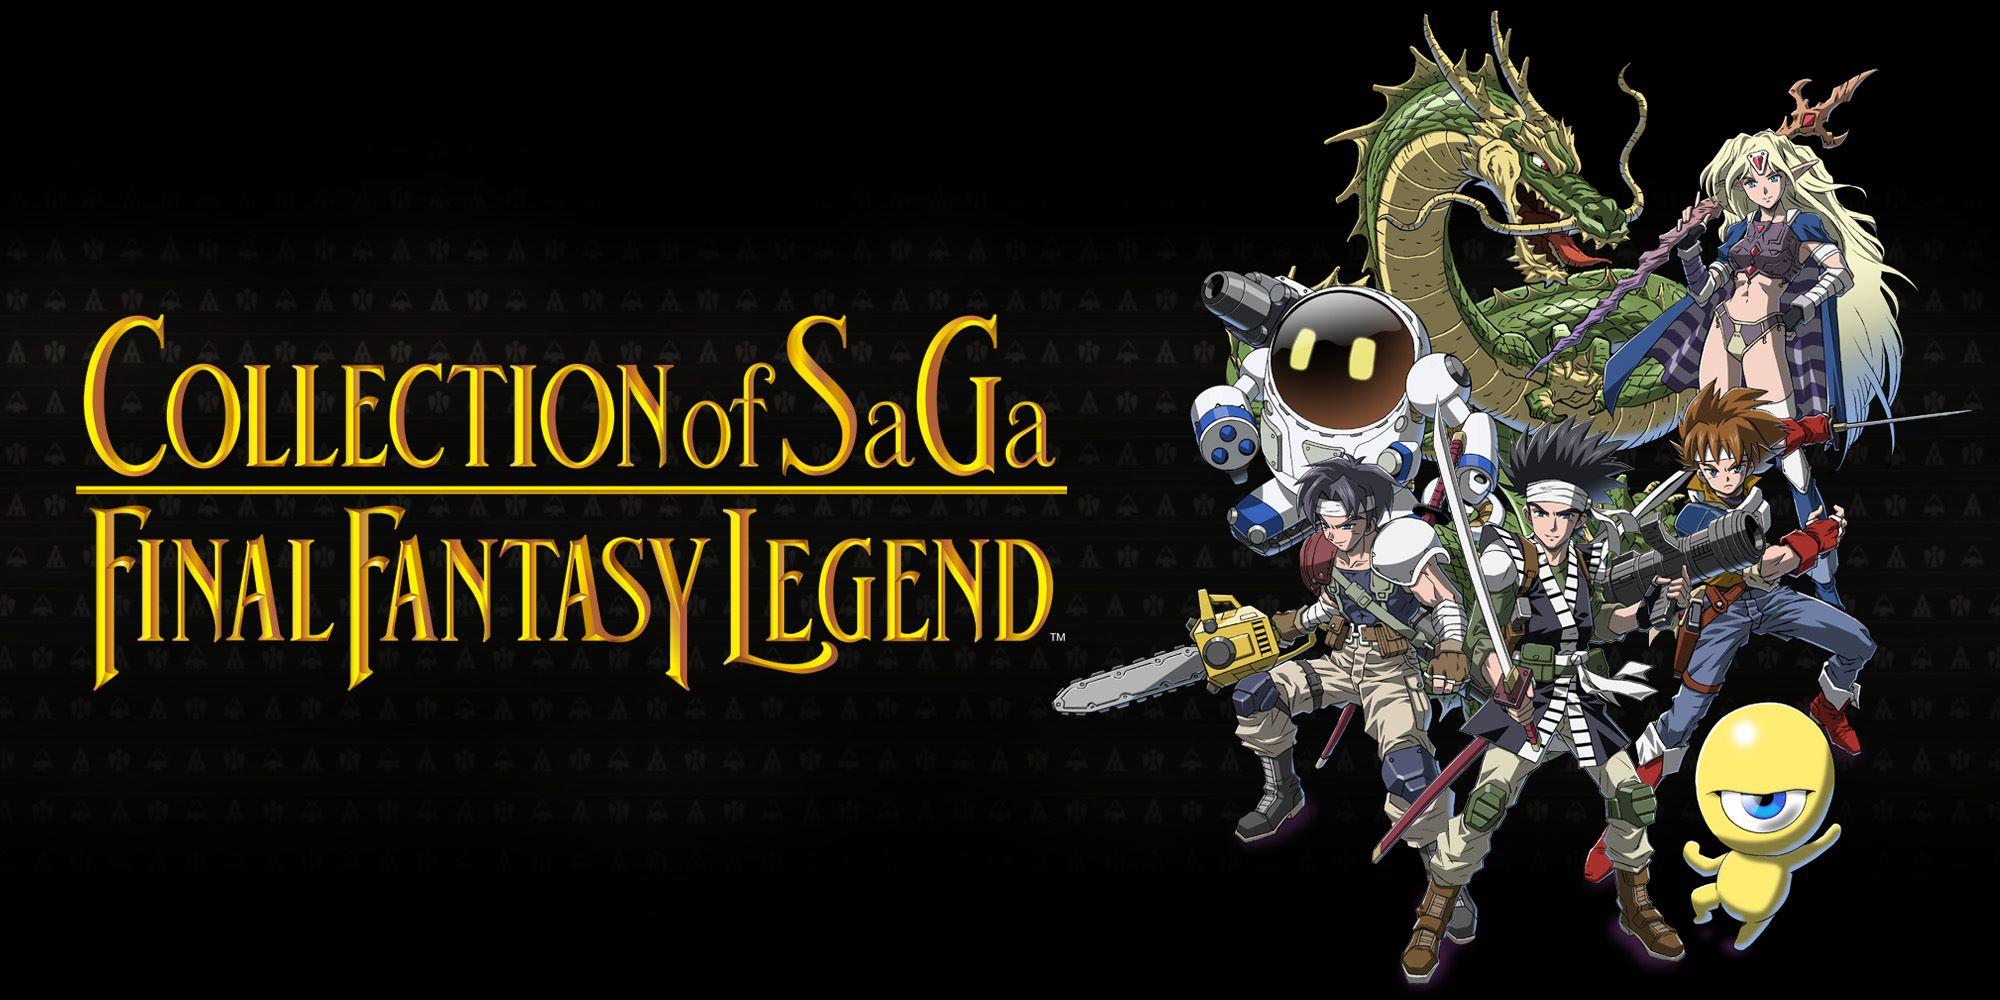 Collection of SaGa Final Fantasy Legend, nuovo trailer dal Tokyo Game Show 2020